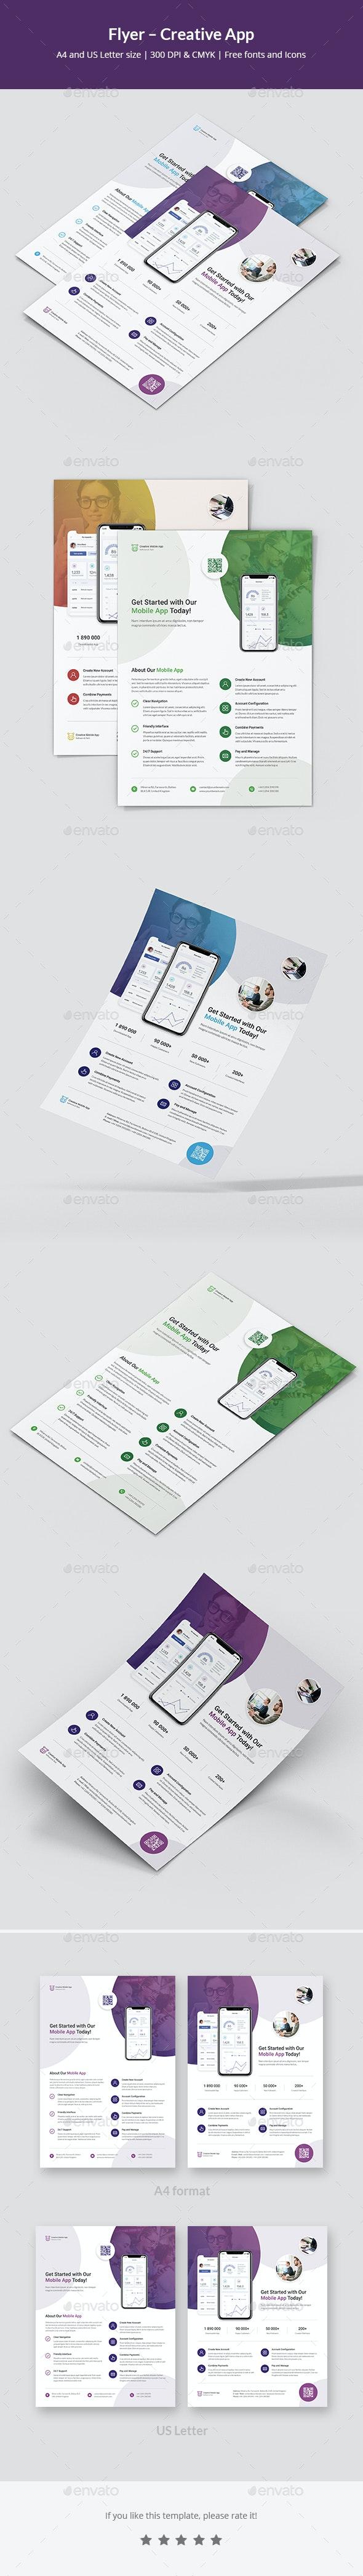 Flyer – Creative App - Commerce Flyers